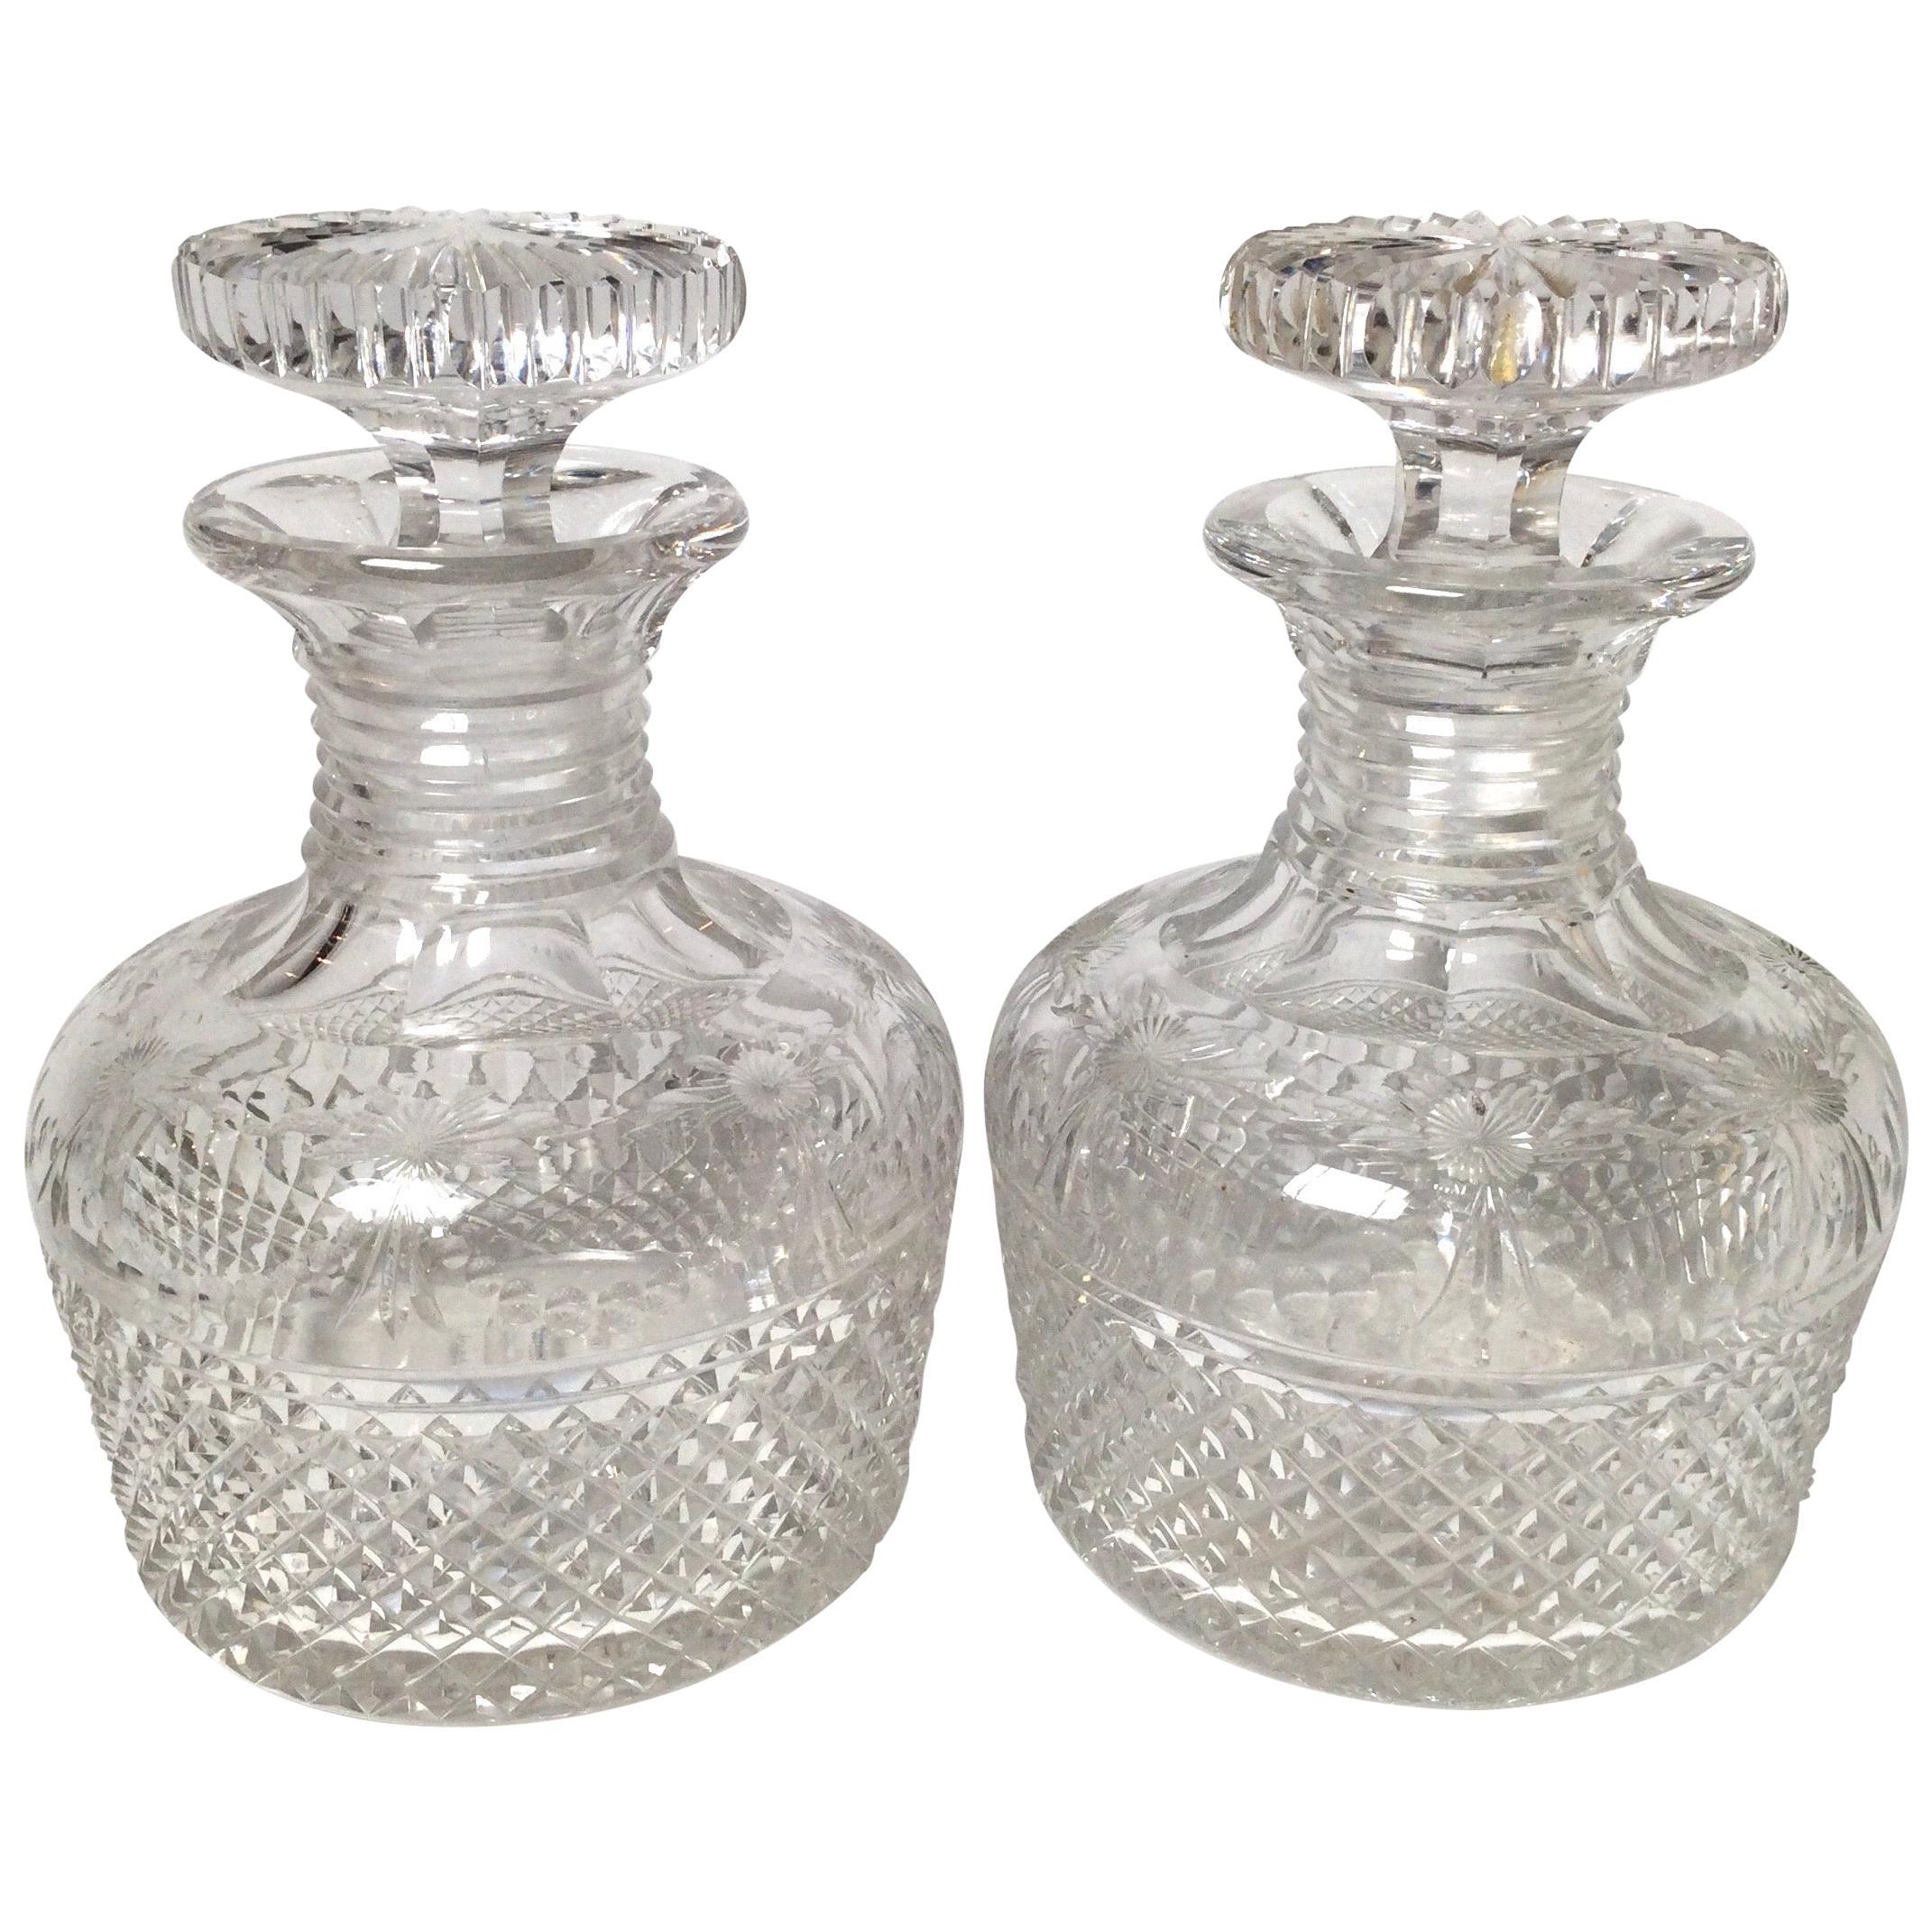 Fine Pair of Handcut English Decanters, 19th Century